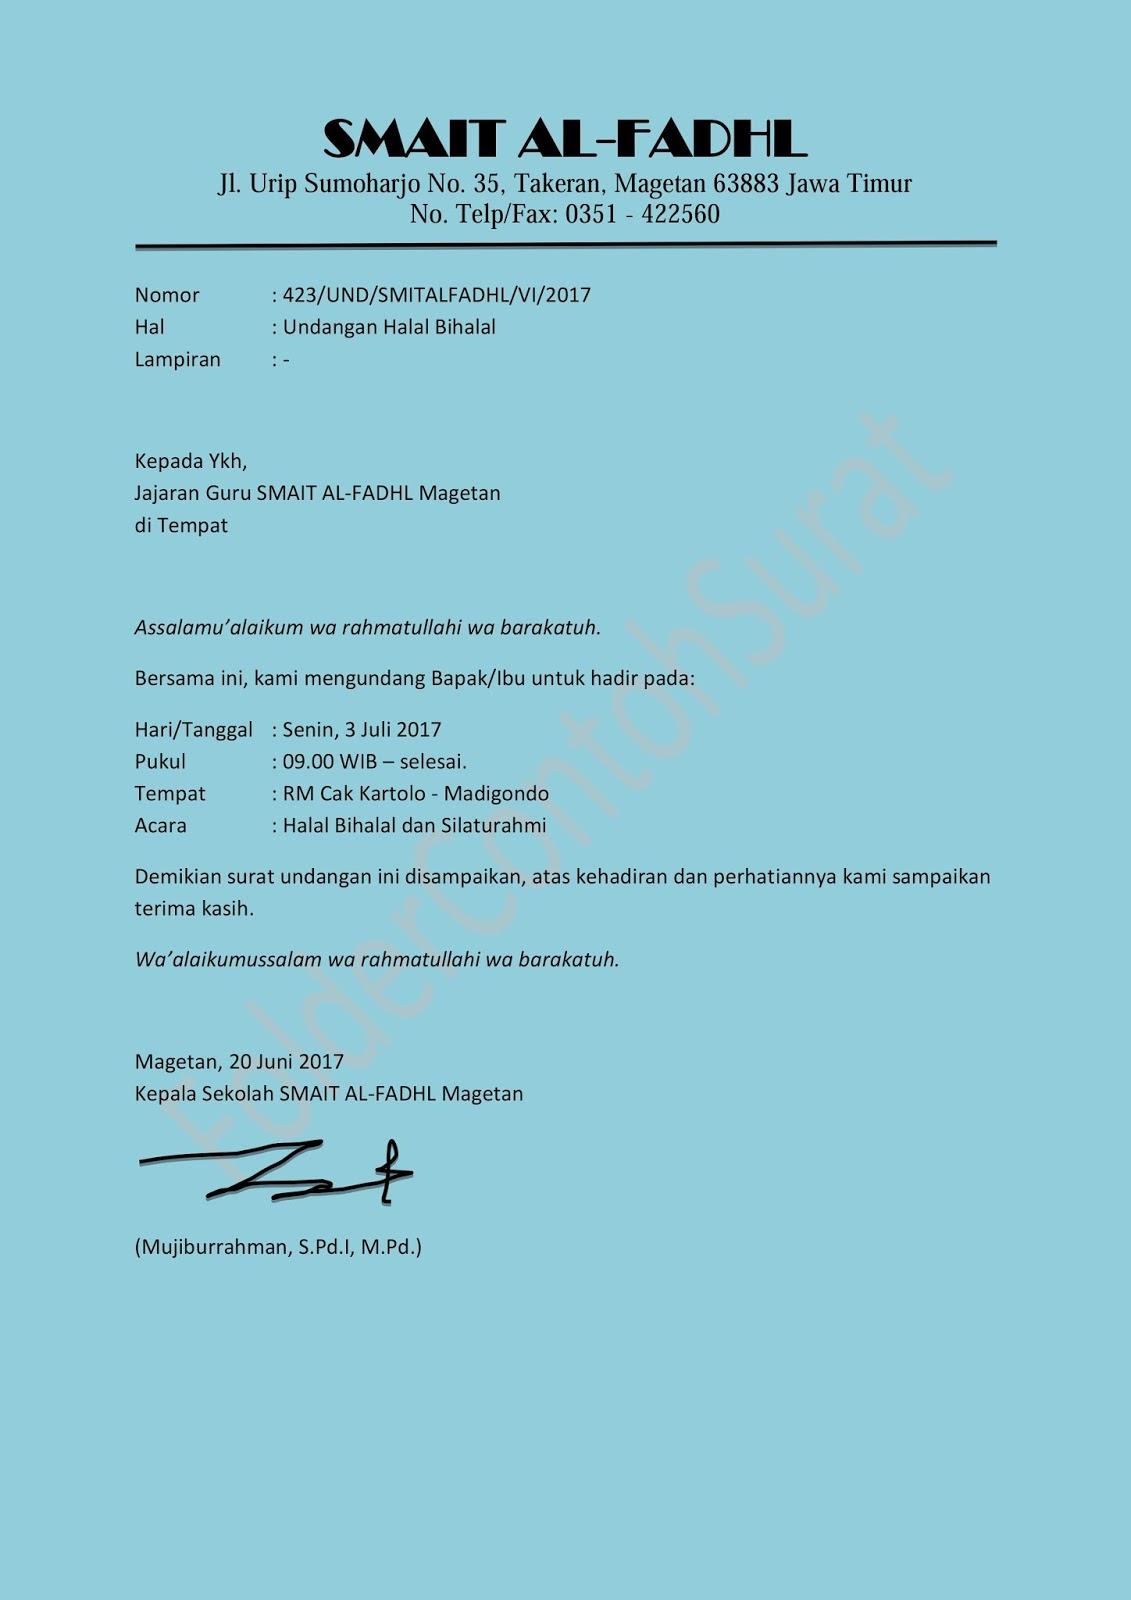 Contoh Surat Undangan Halal Bihalal Idul Fitri Folder Contoh Surat